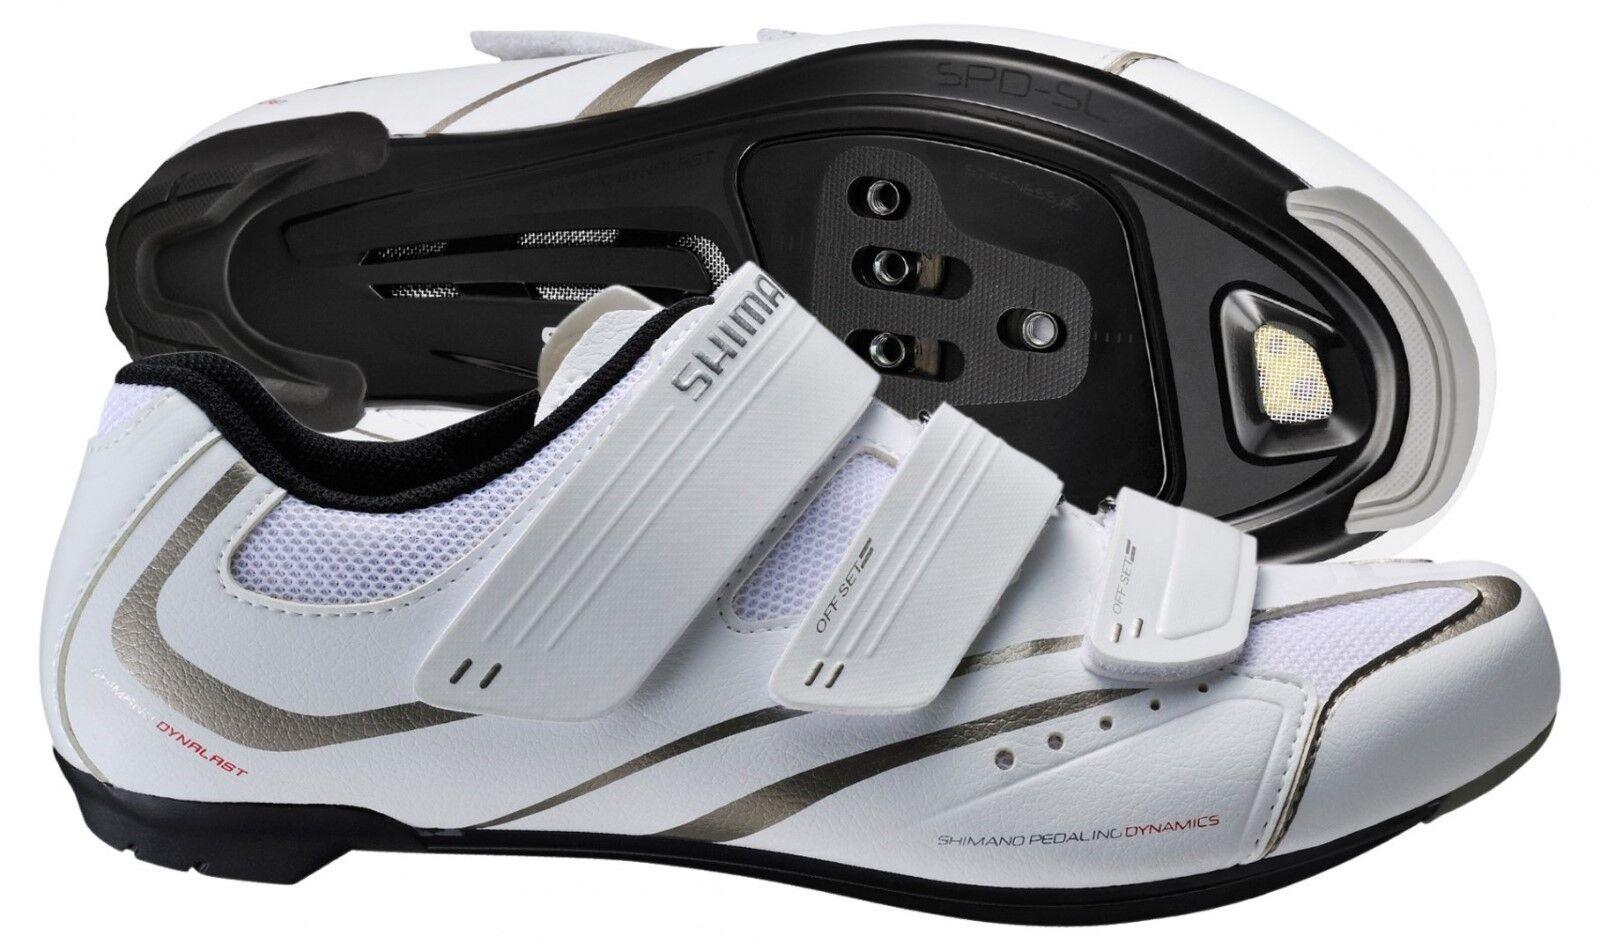 Shimano SH-WR32 Road Cycling Women's shoes SPD SL Clipless Bike Spinning White